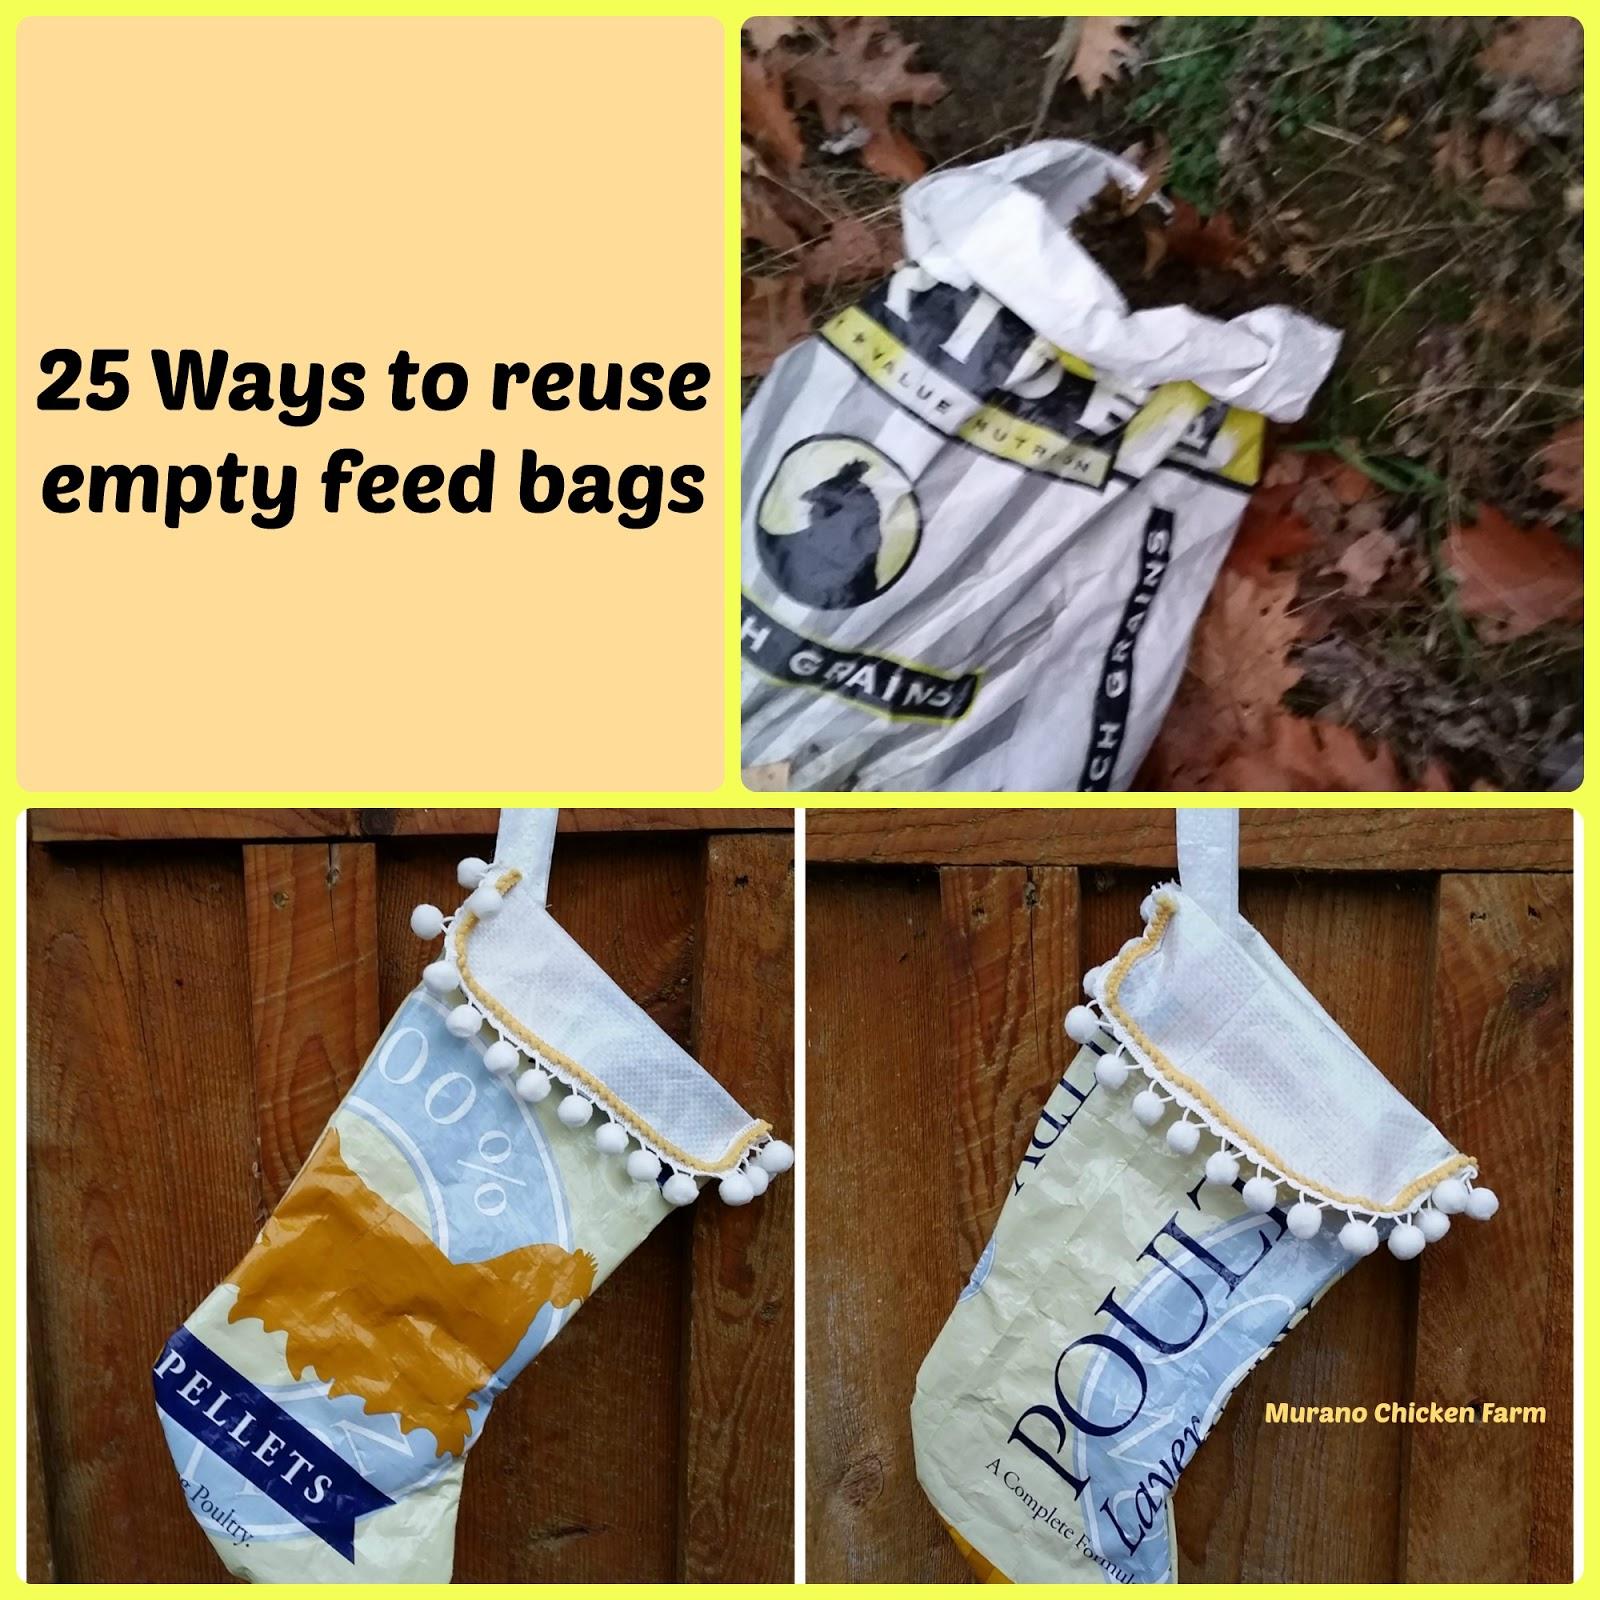 Murano Chicken Farm 25 Ways To Use Empty Feed Bags